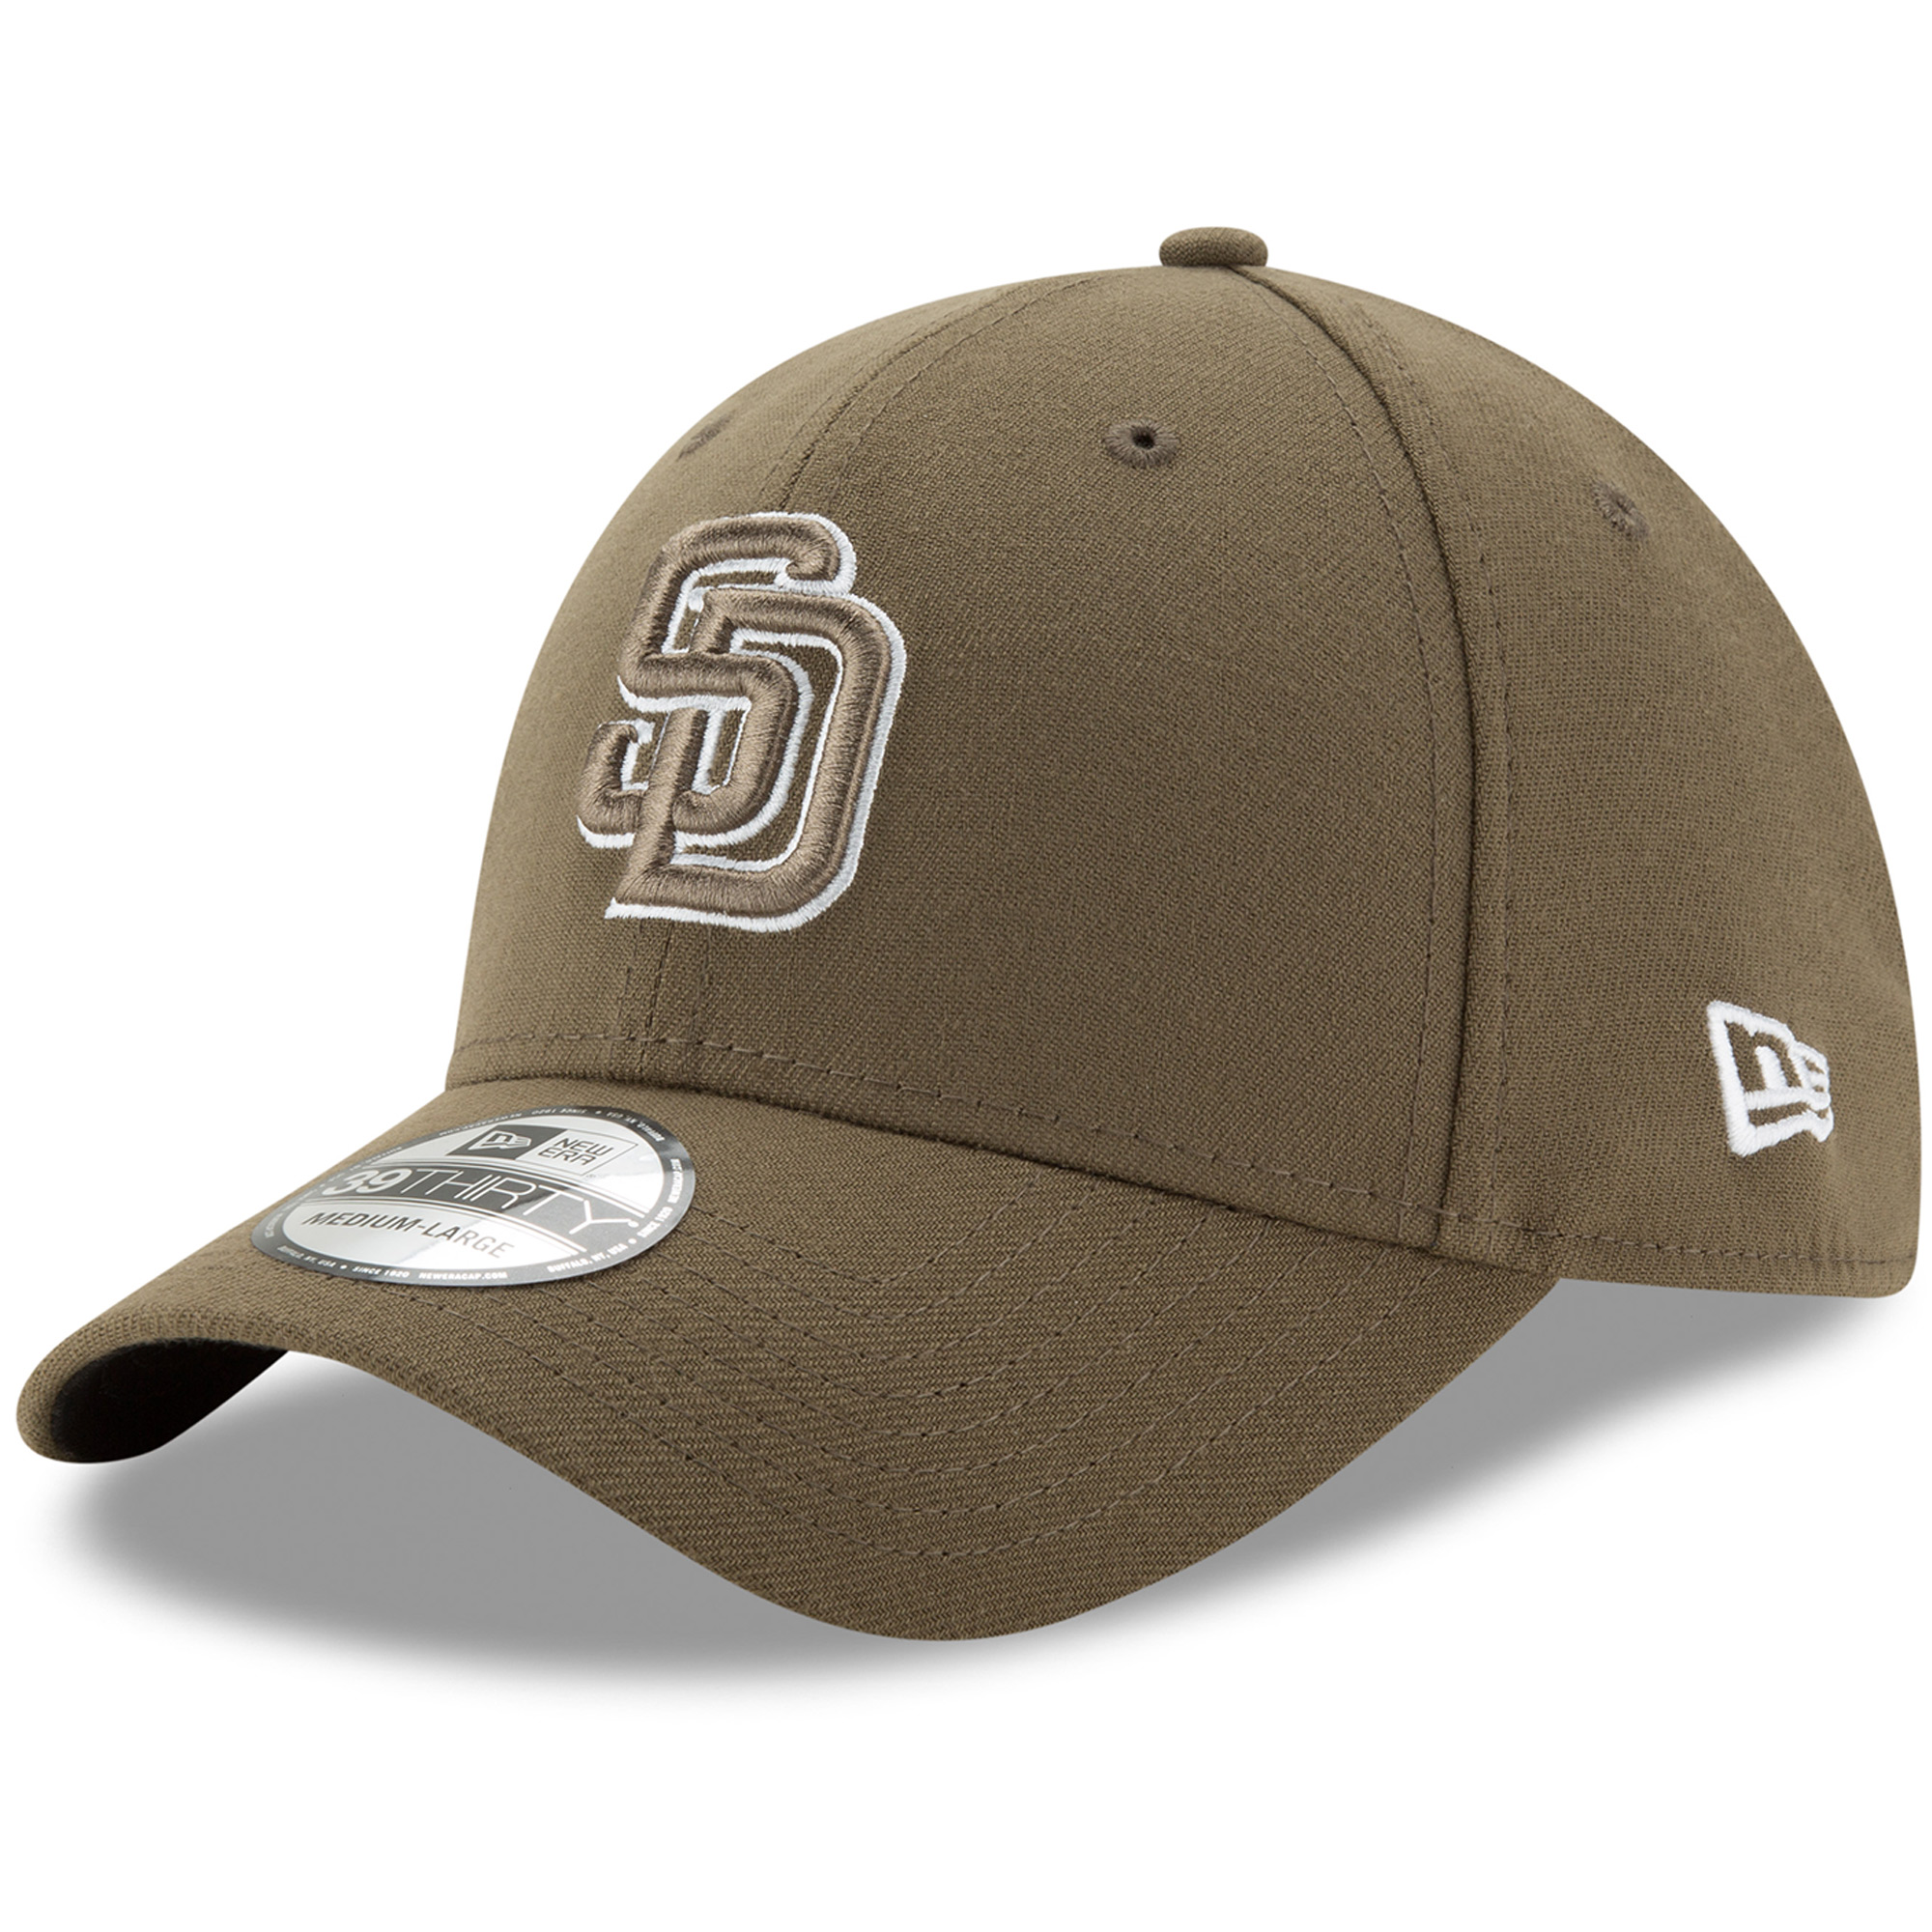 San Diego Padres New Era Alternate Team Classic 39THIRTY Flex Hat - Olive